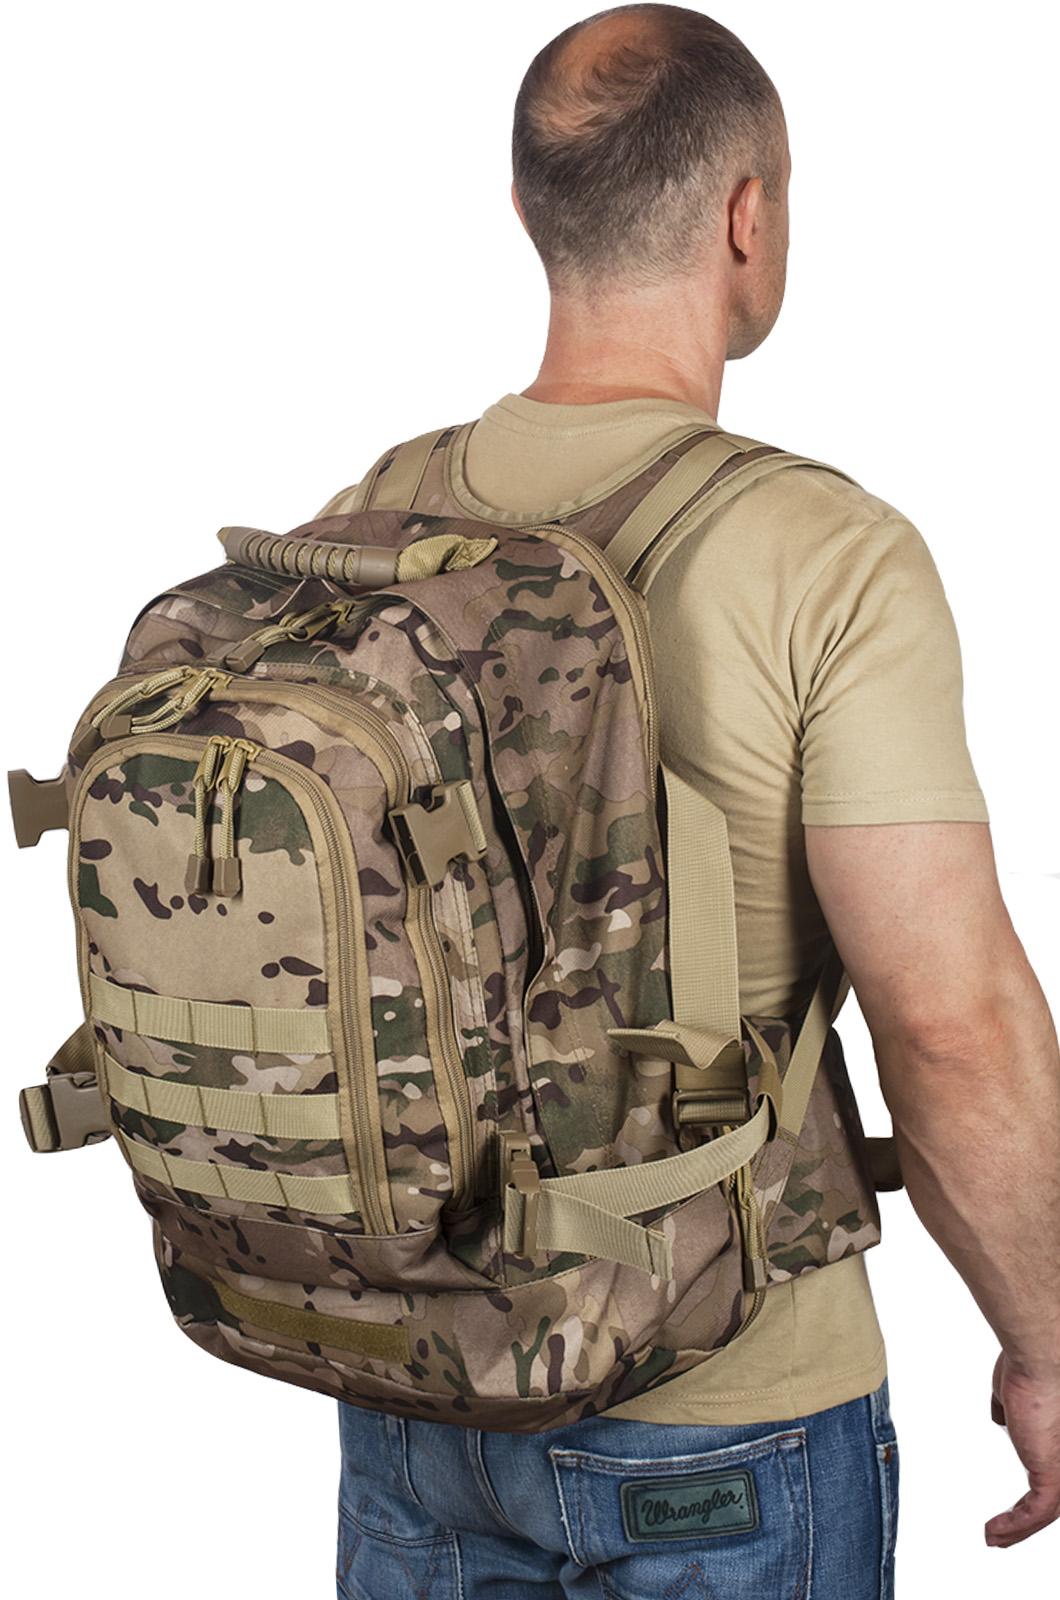 Рюкзак снайпера 3-Day Expandable Backpack 08002A Multicam высокого качества